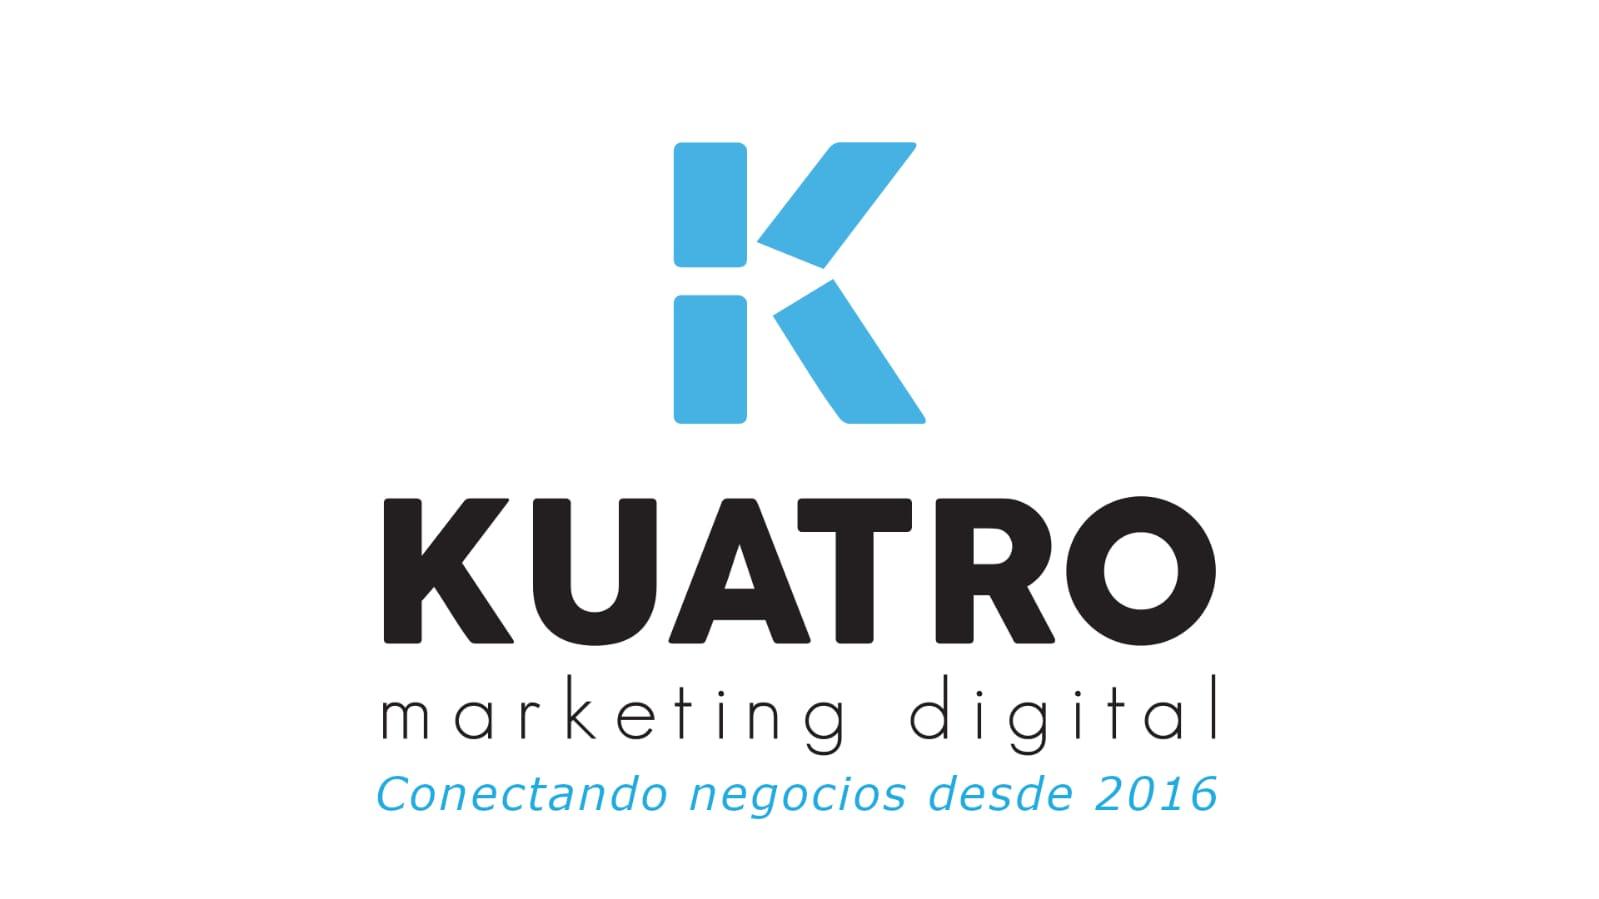 Kuatro Marketing Digital